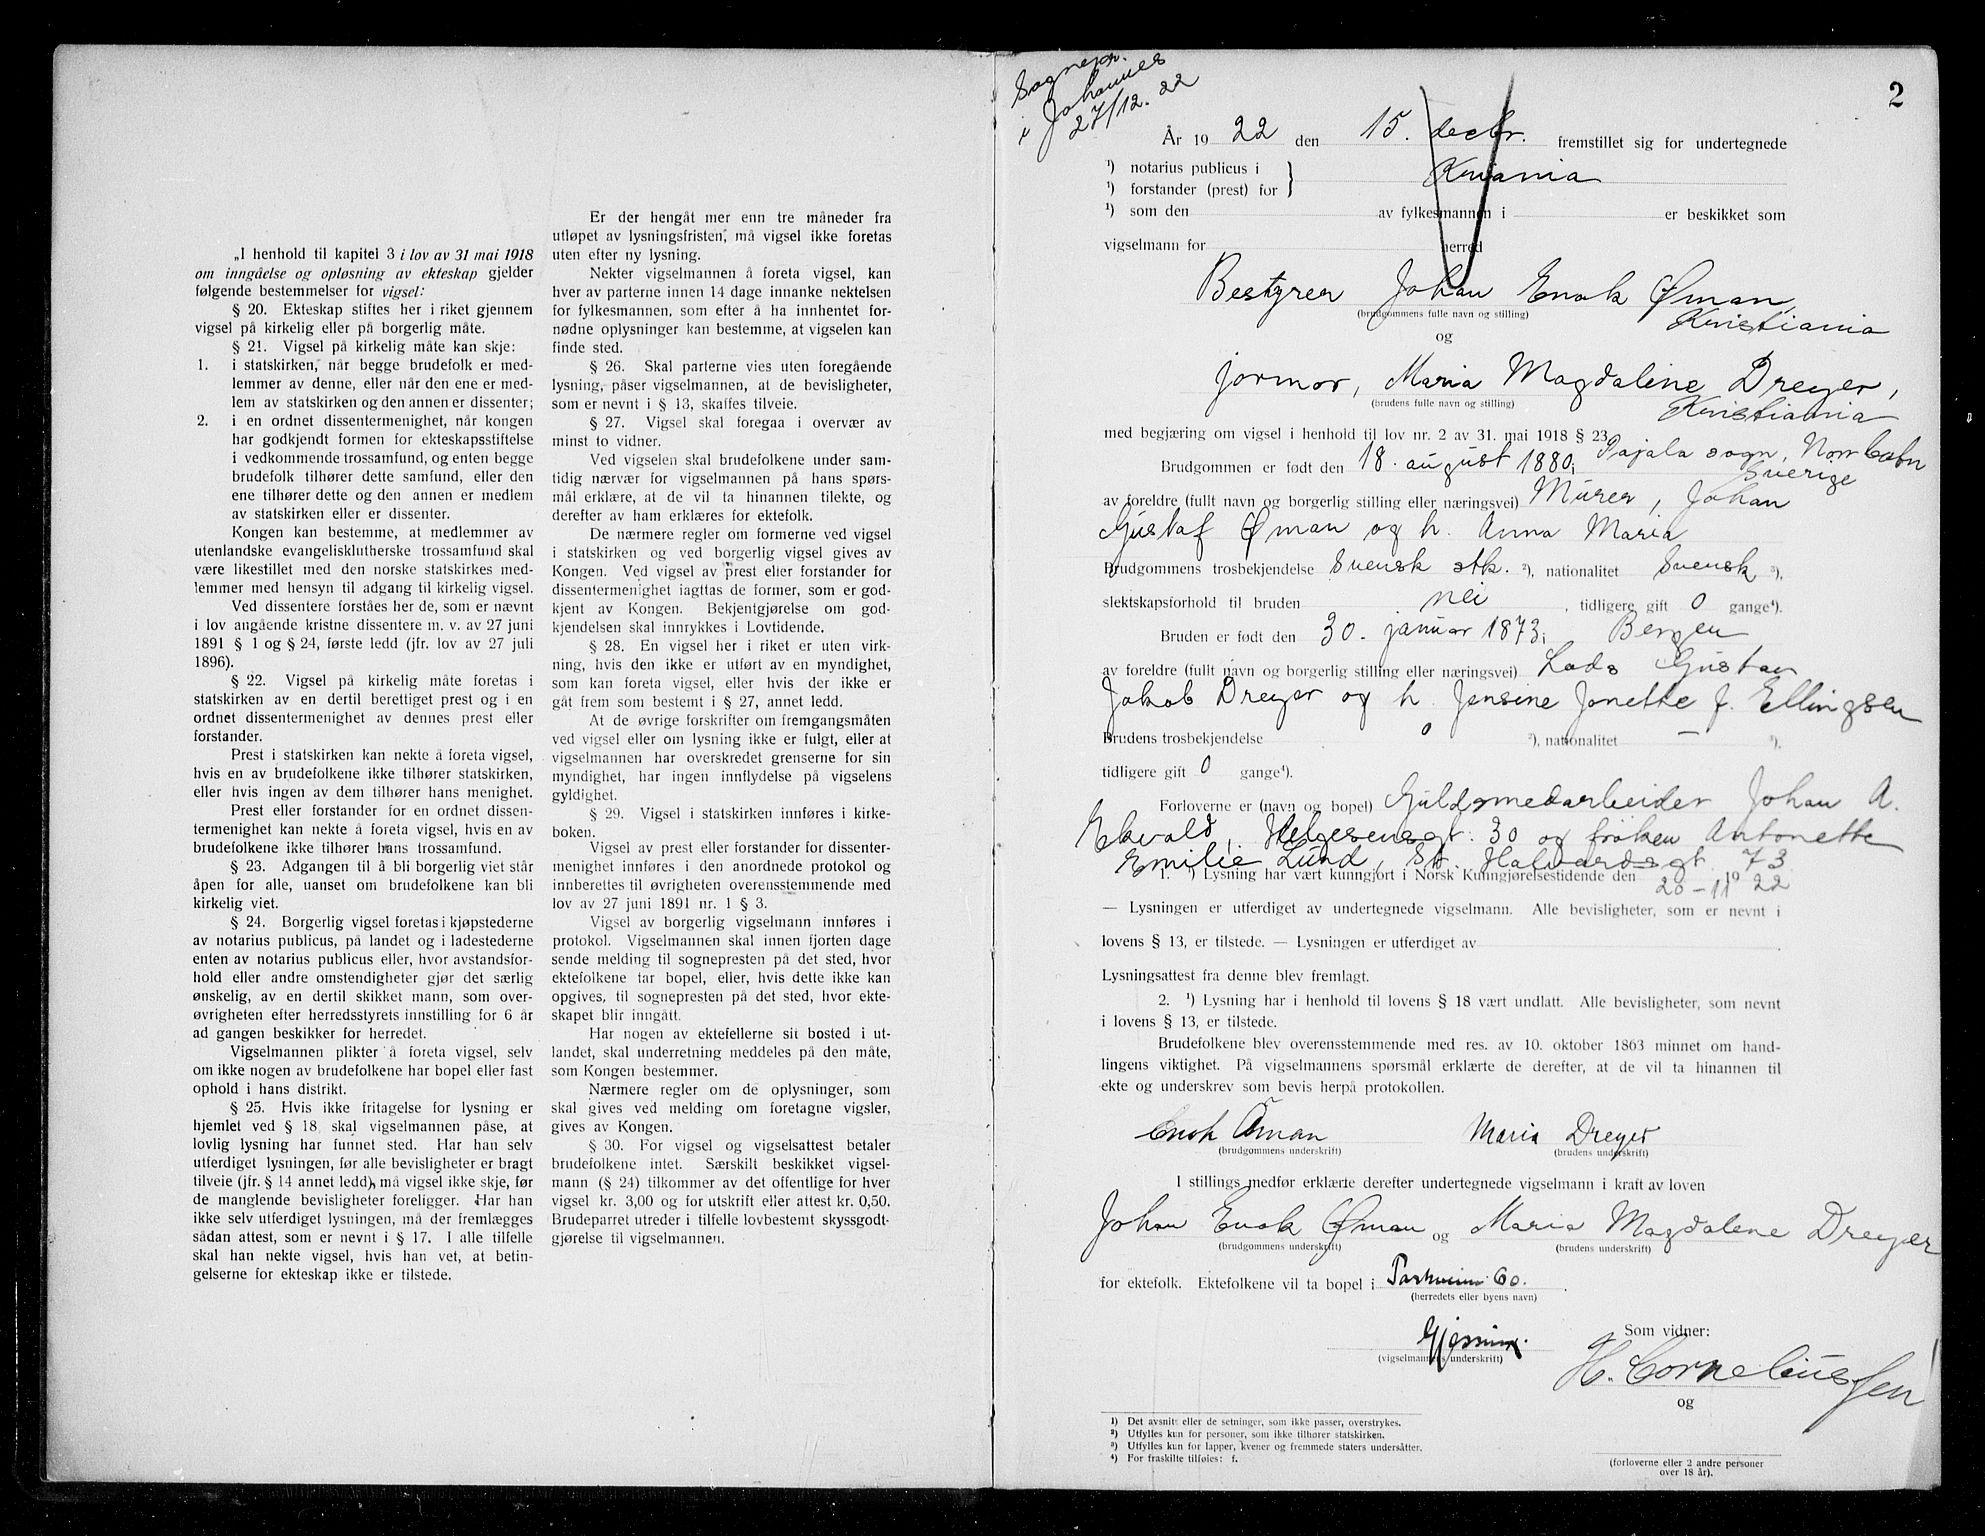 SAO, Oslo byfogd avd. I, L/Lb/Lbb/L0016: Notarialprotokoll, rekke II: Vigsler, 1922-1924, s. 1b-2a